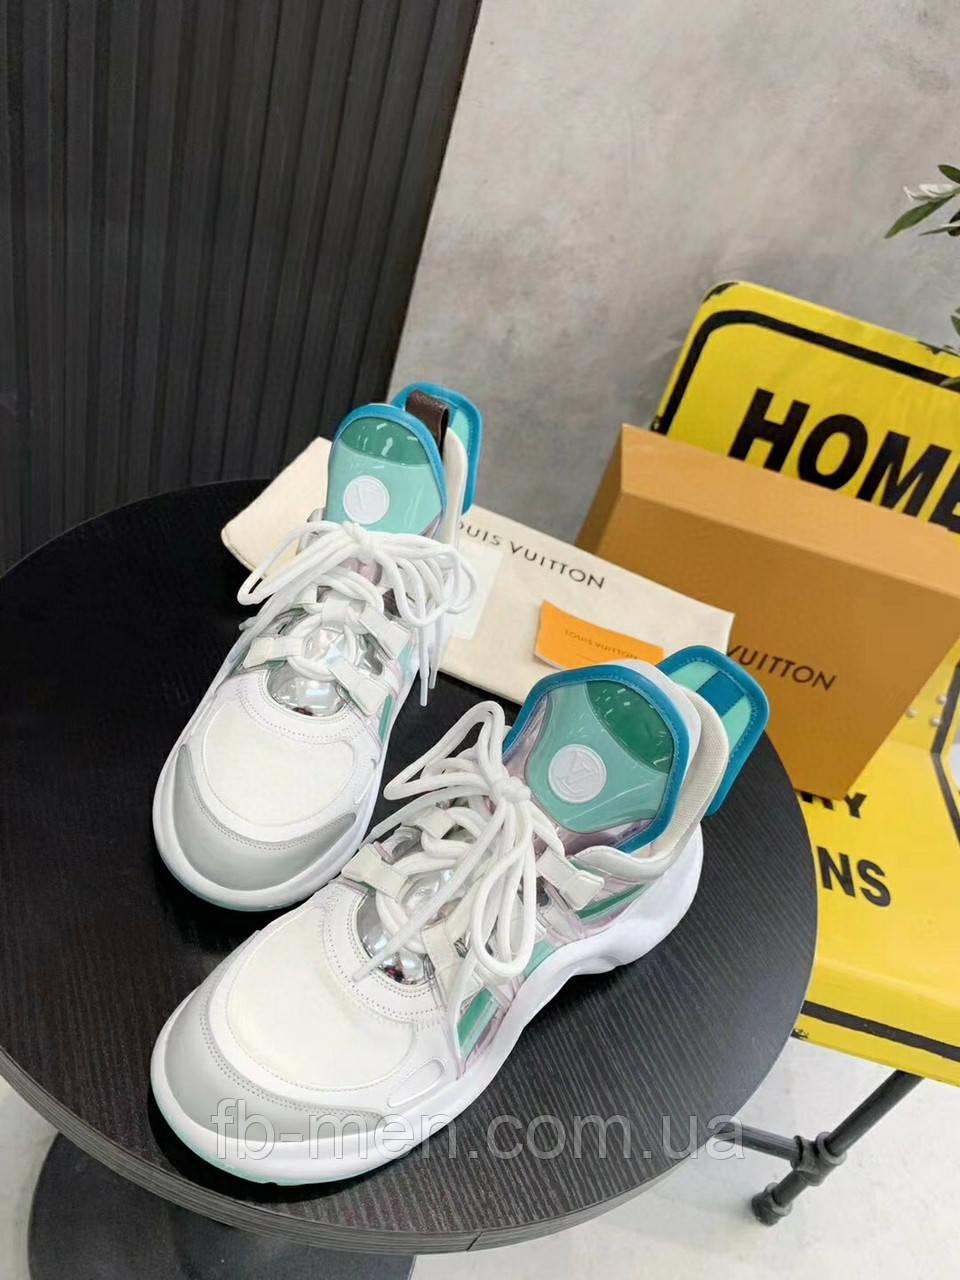 Бело-бирюзовые кроссовки Louis Vuitton